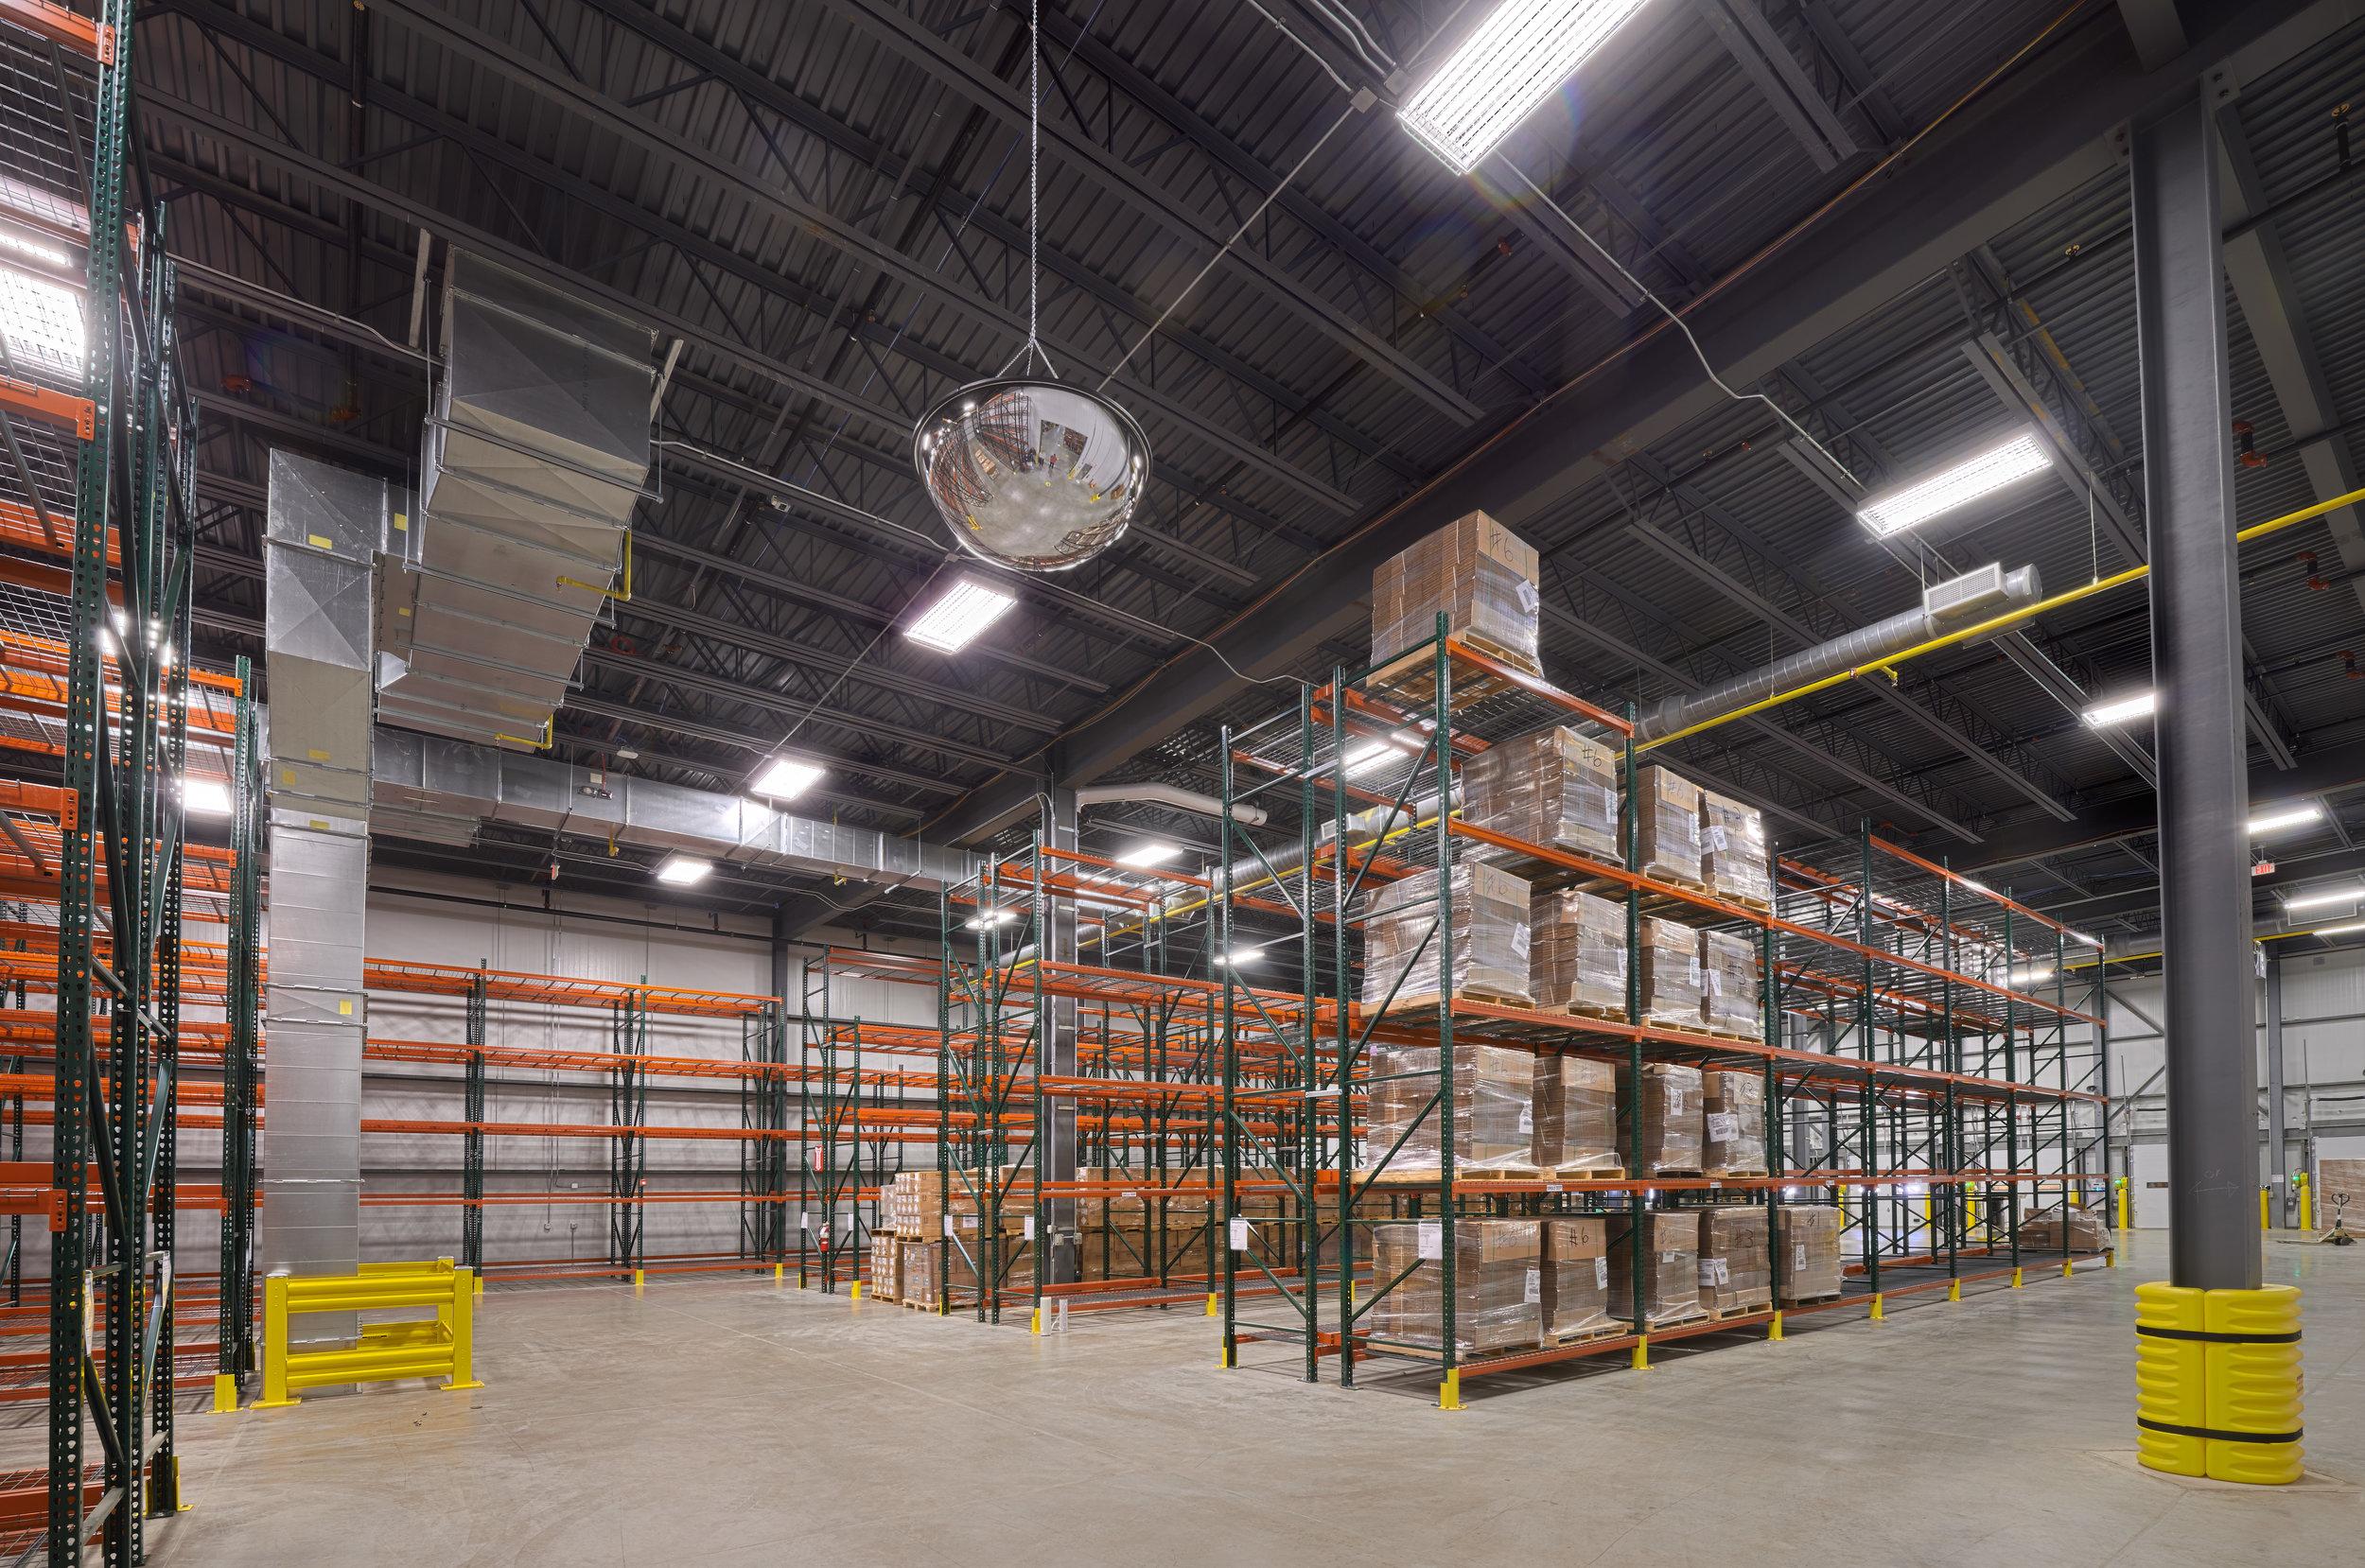 WarehouseView4.jpg